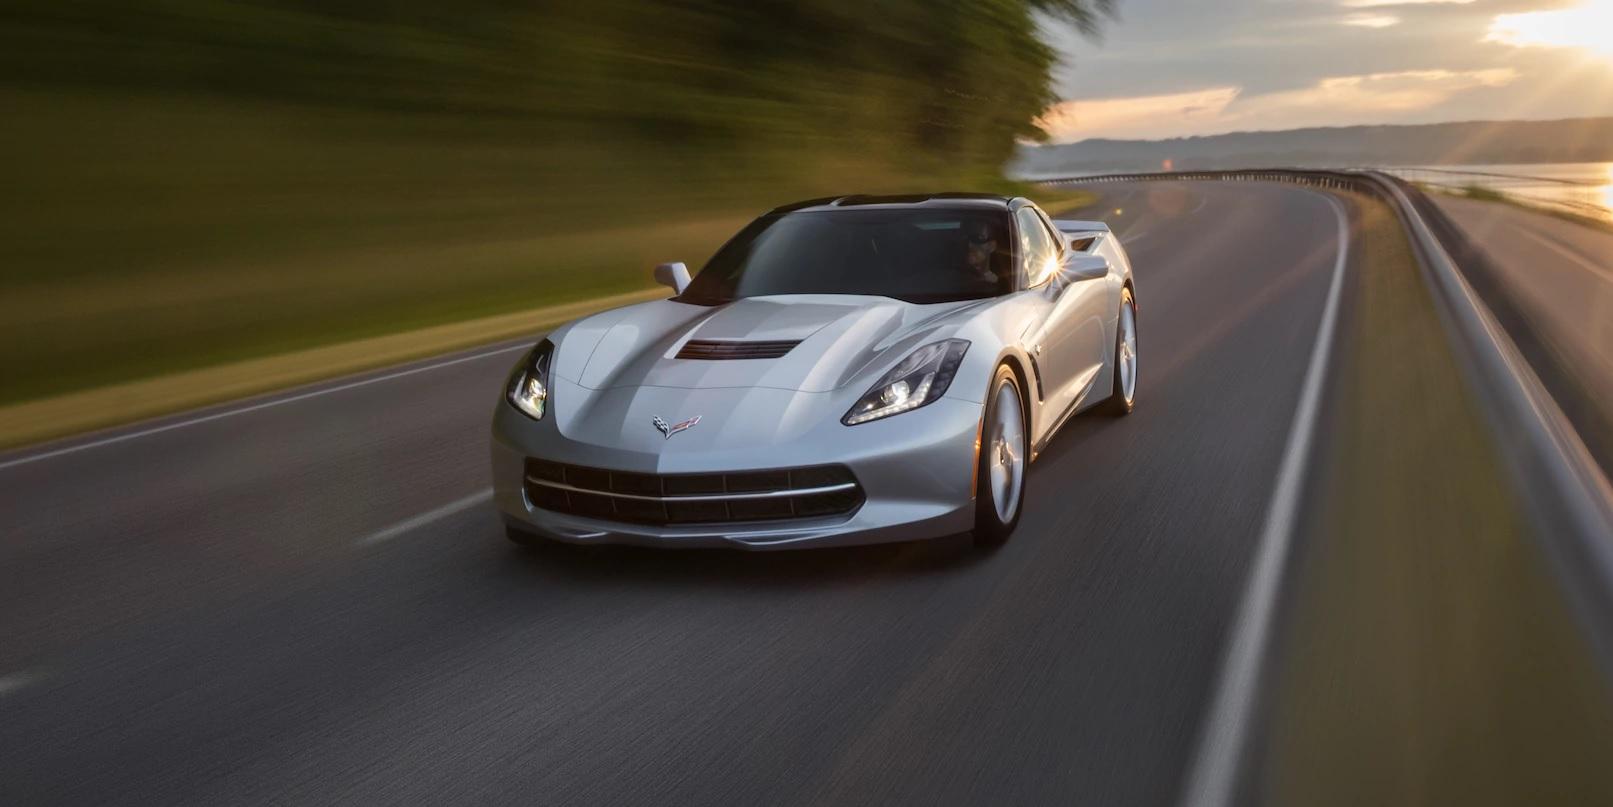 2018 Chevrolet Corvette for Sale in Sylvania, OH - Dave White Chevrolet